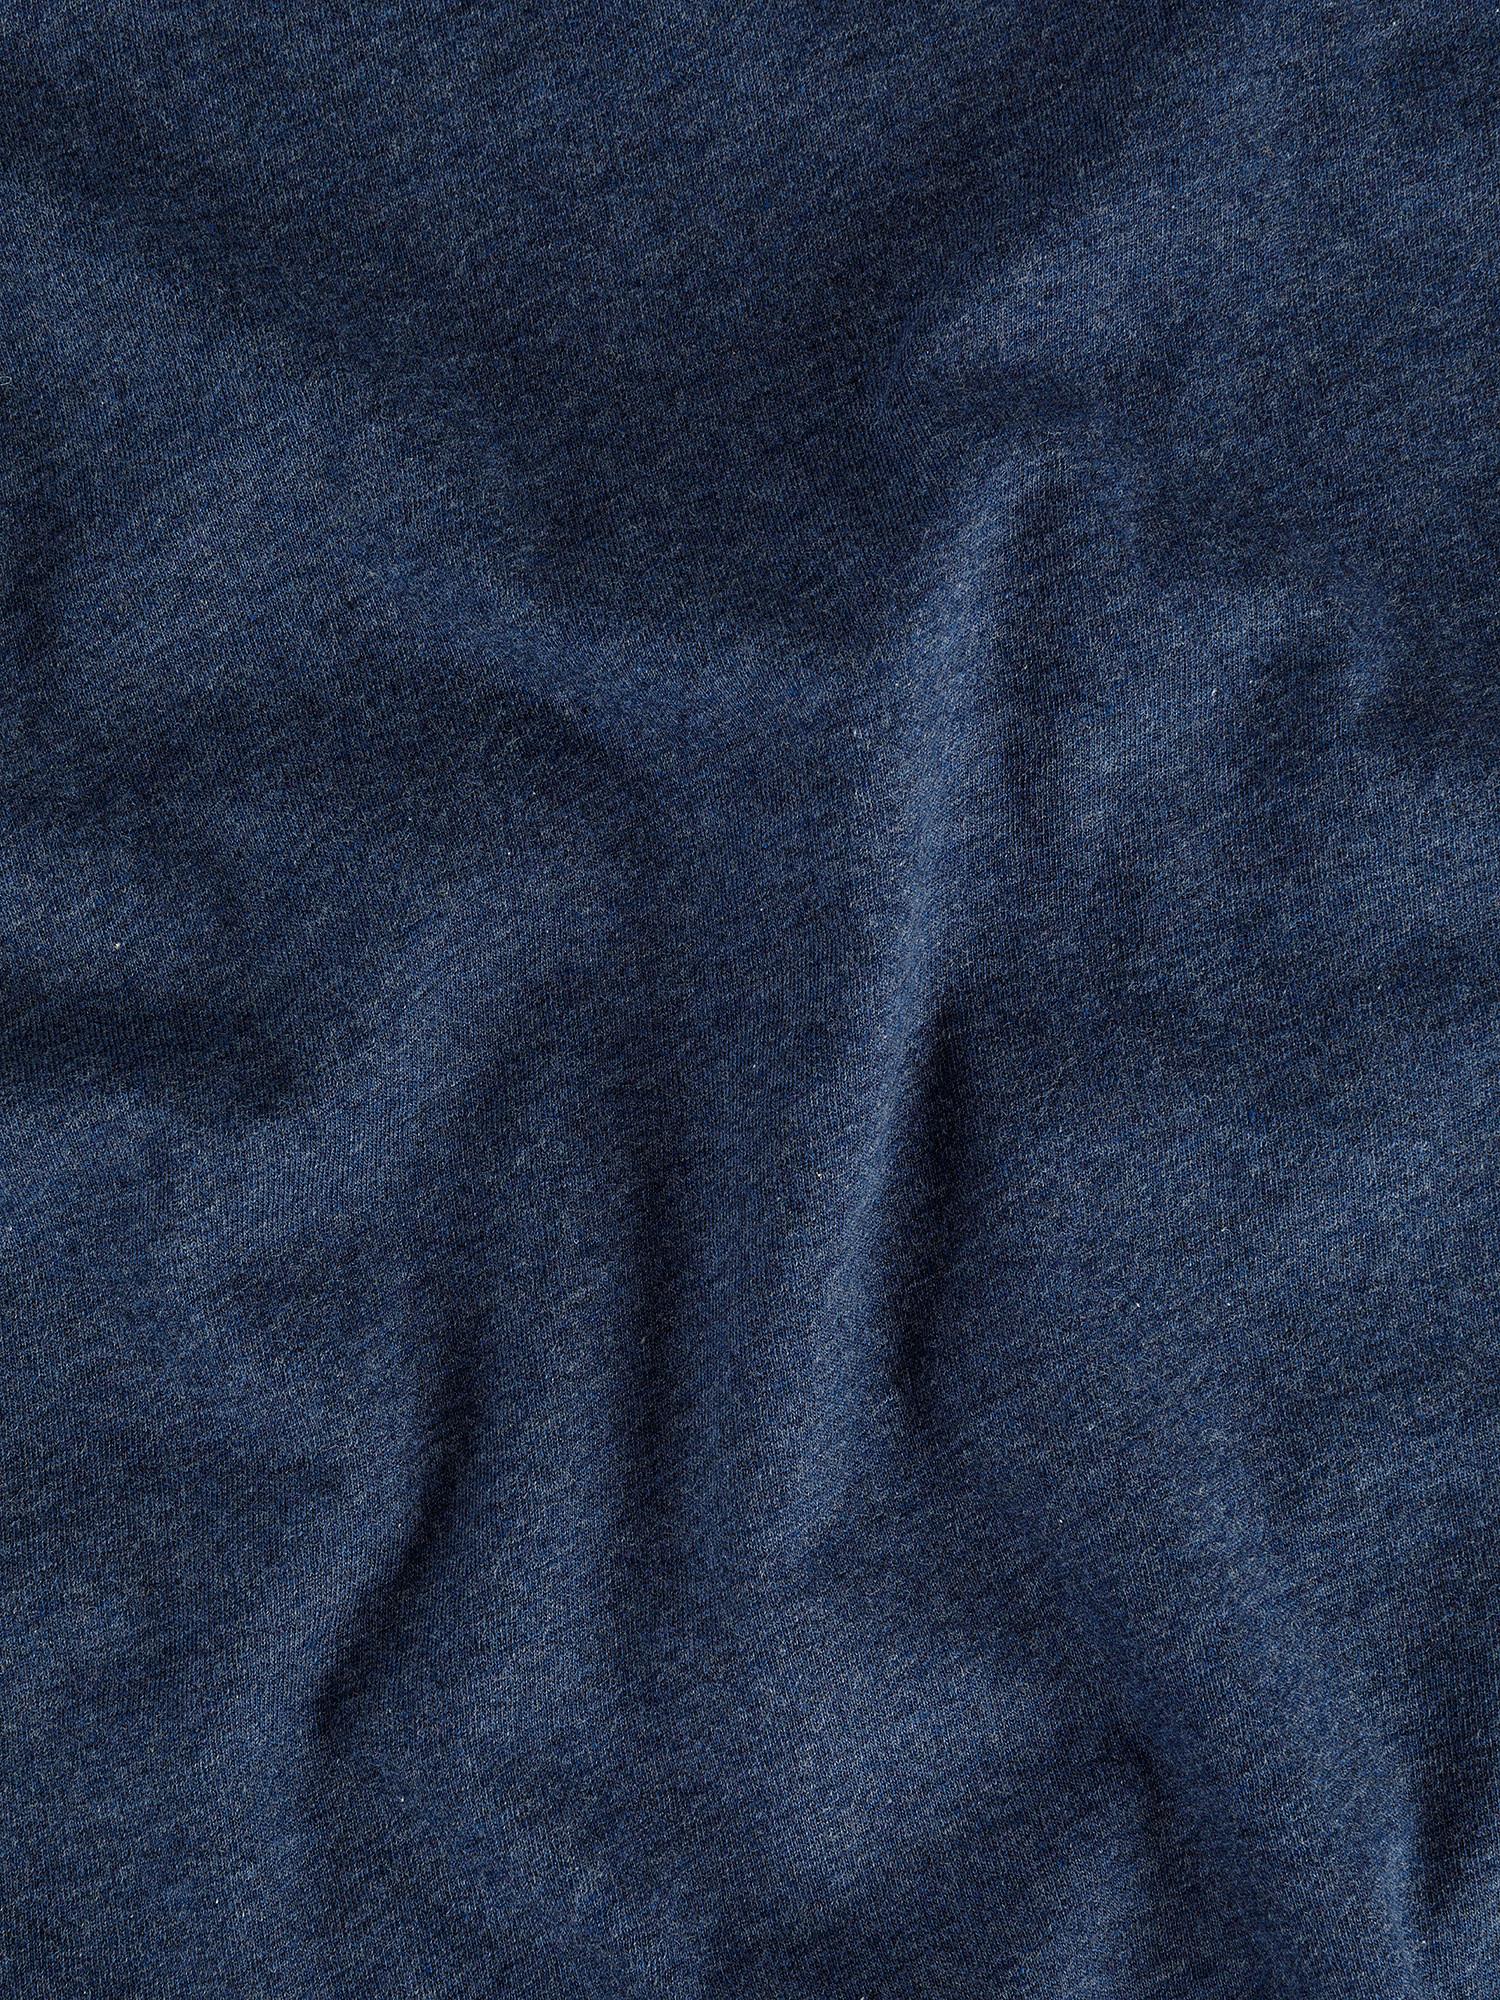 Parure copripiumino jersey di cotone tinta unita, Blu, large image number 2